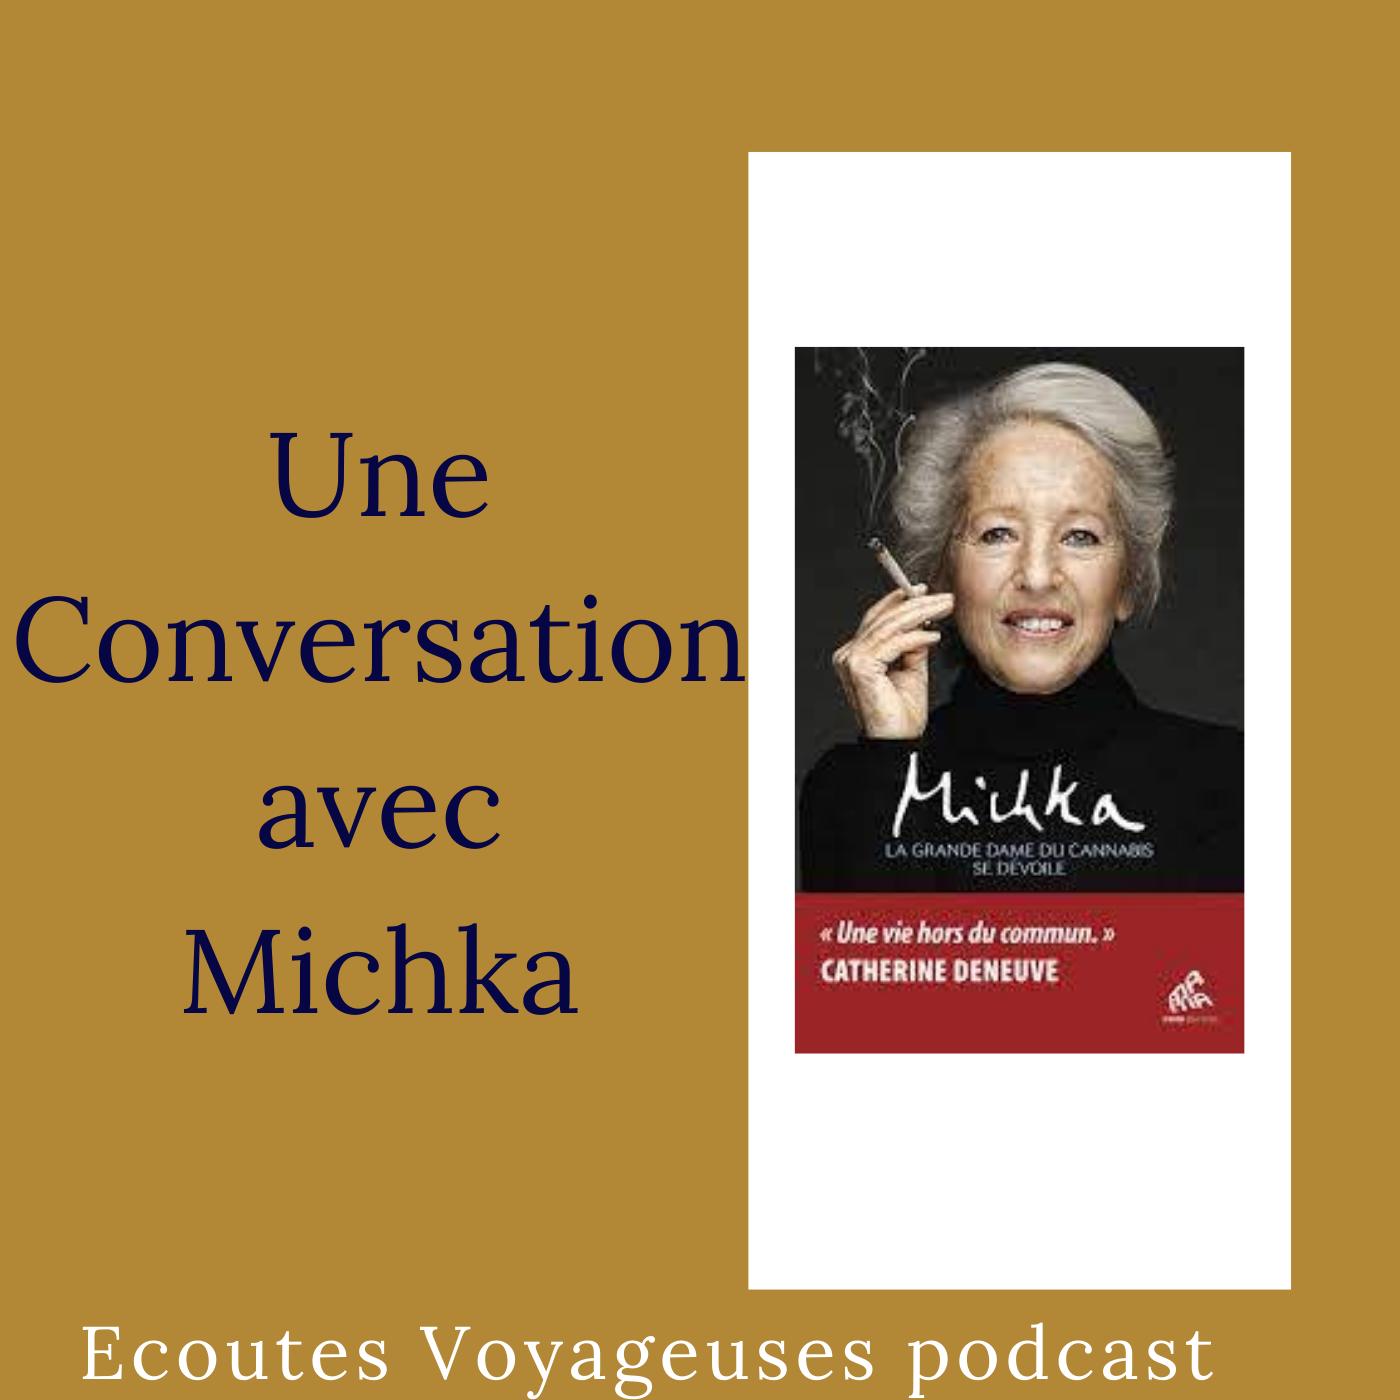 Conversation avec Michka, la grande dame du cannabis